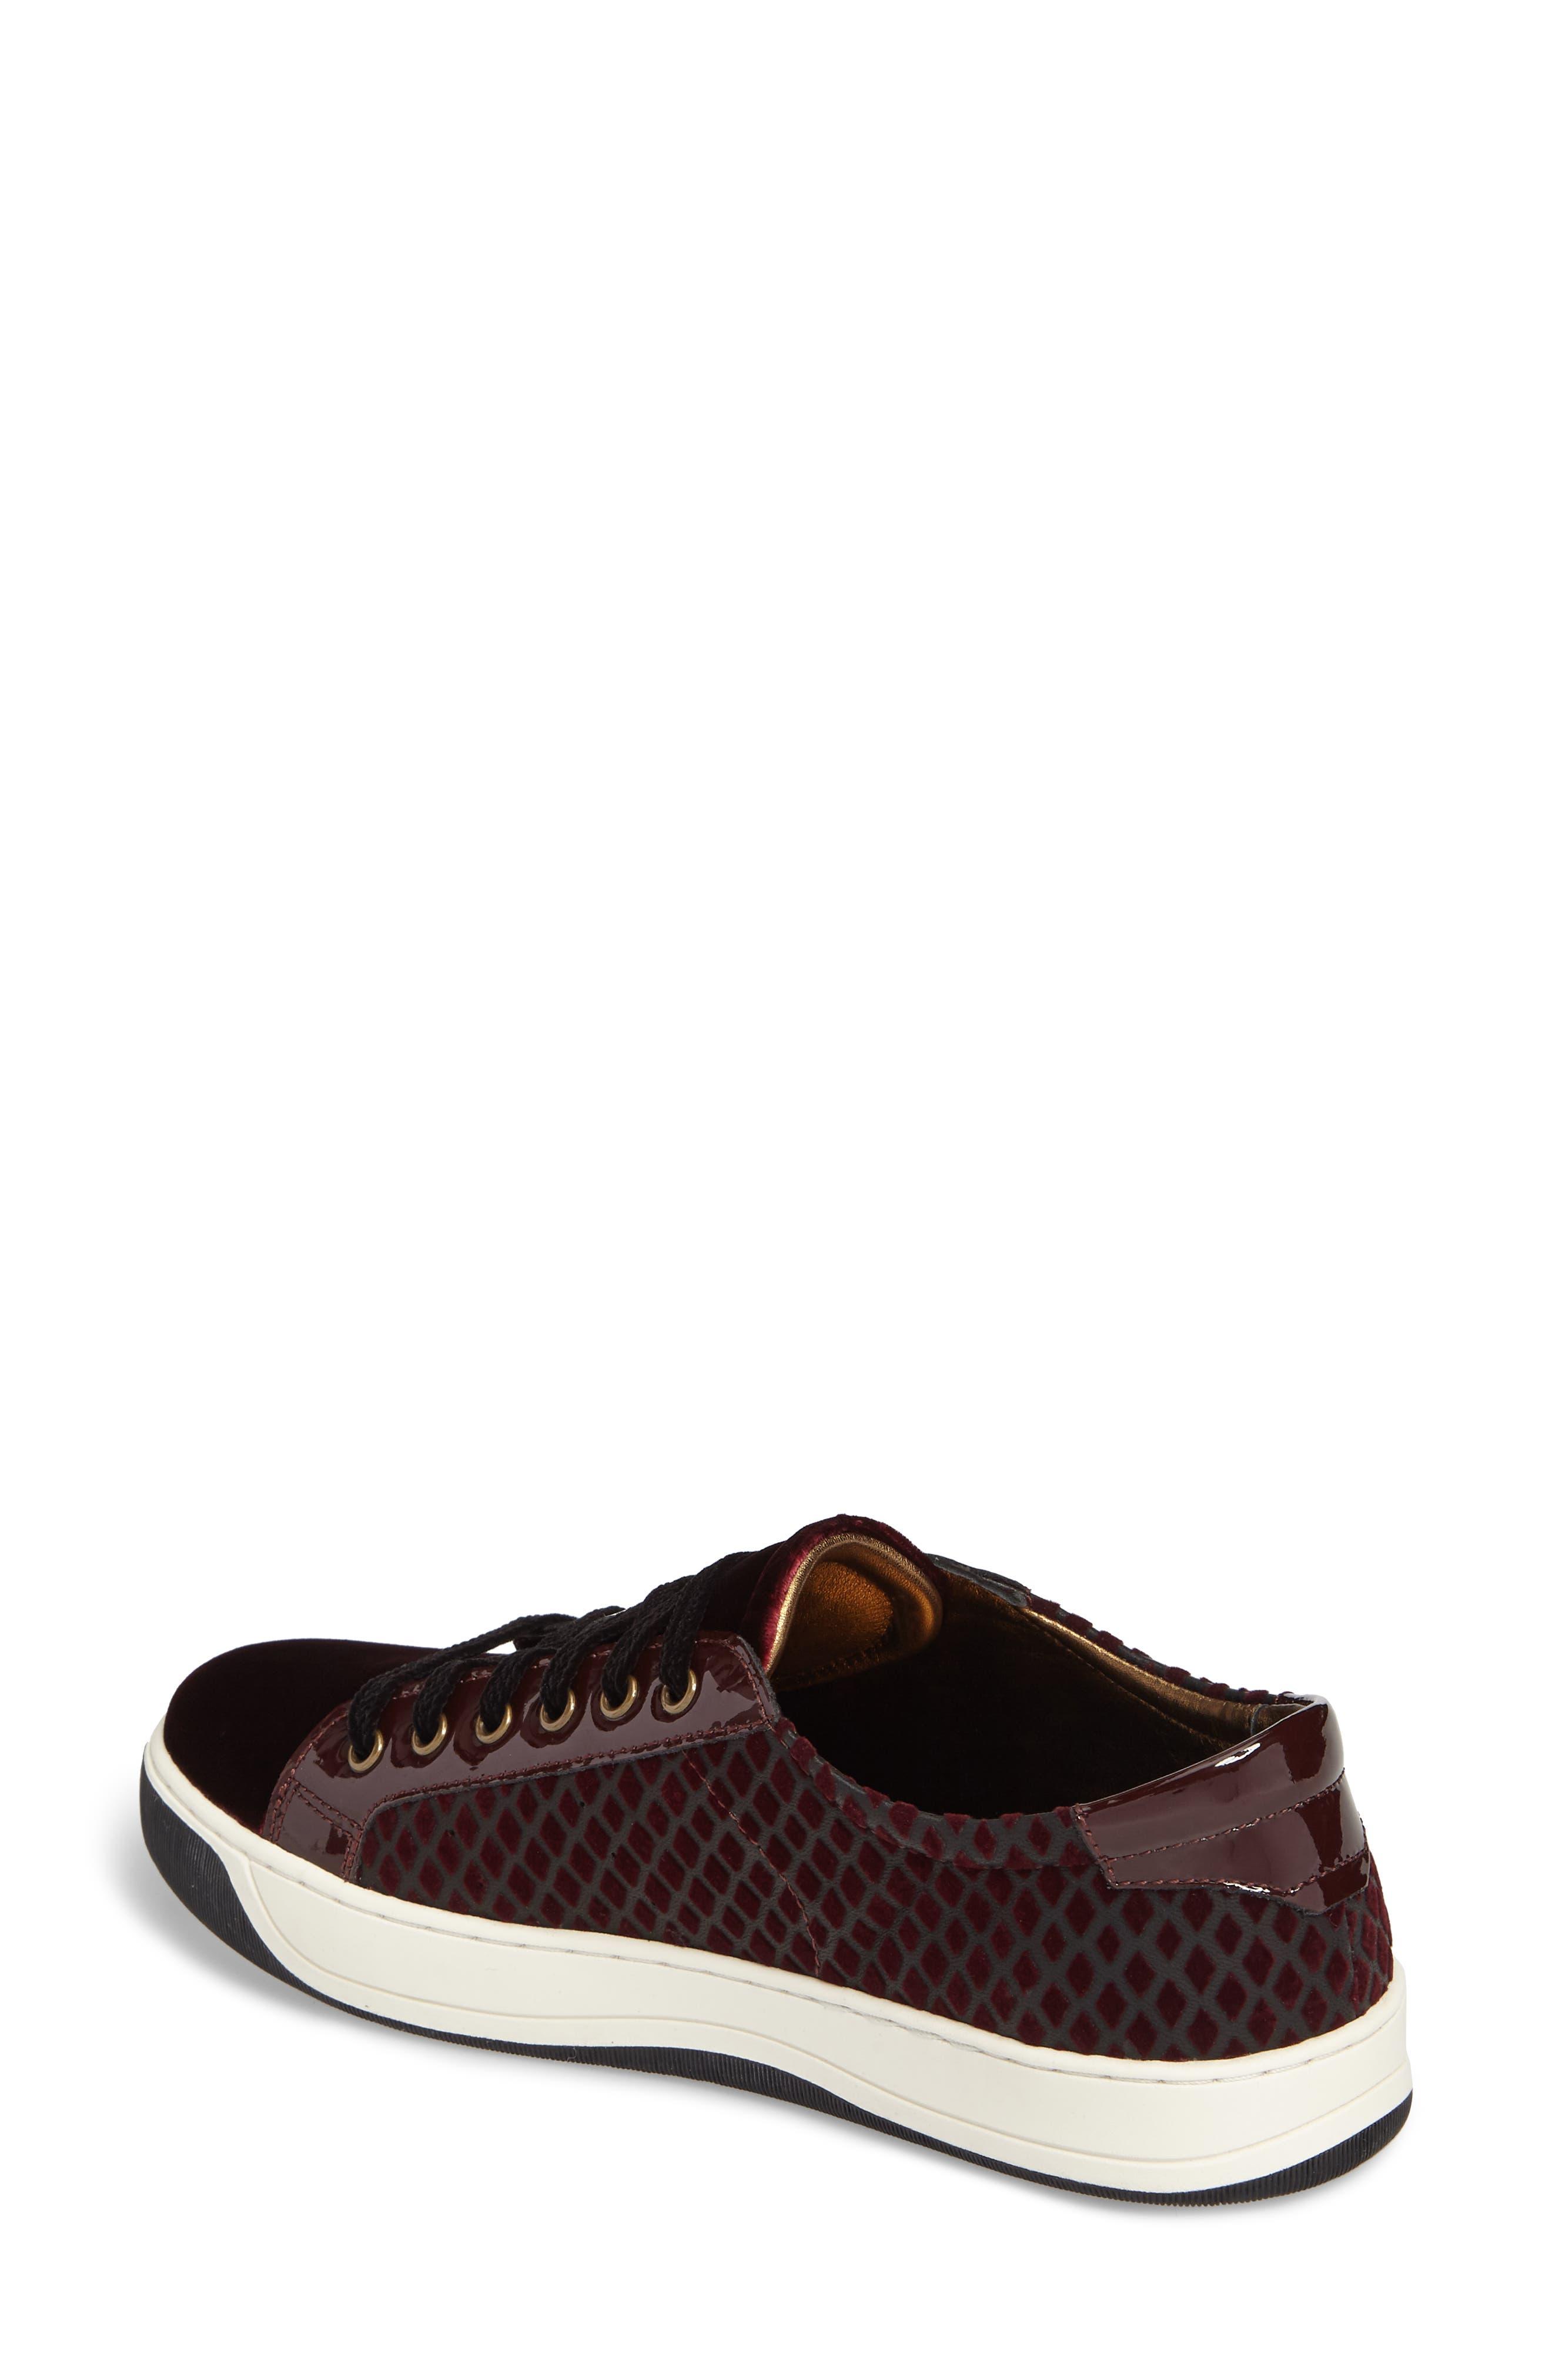 Alternate Image 2  - Johnston & Murphy 'Emerson' Sneaker (Women)